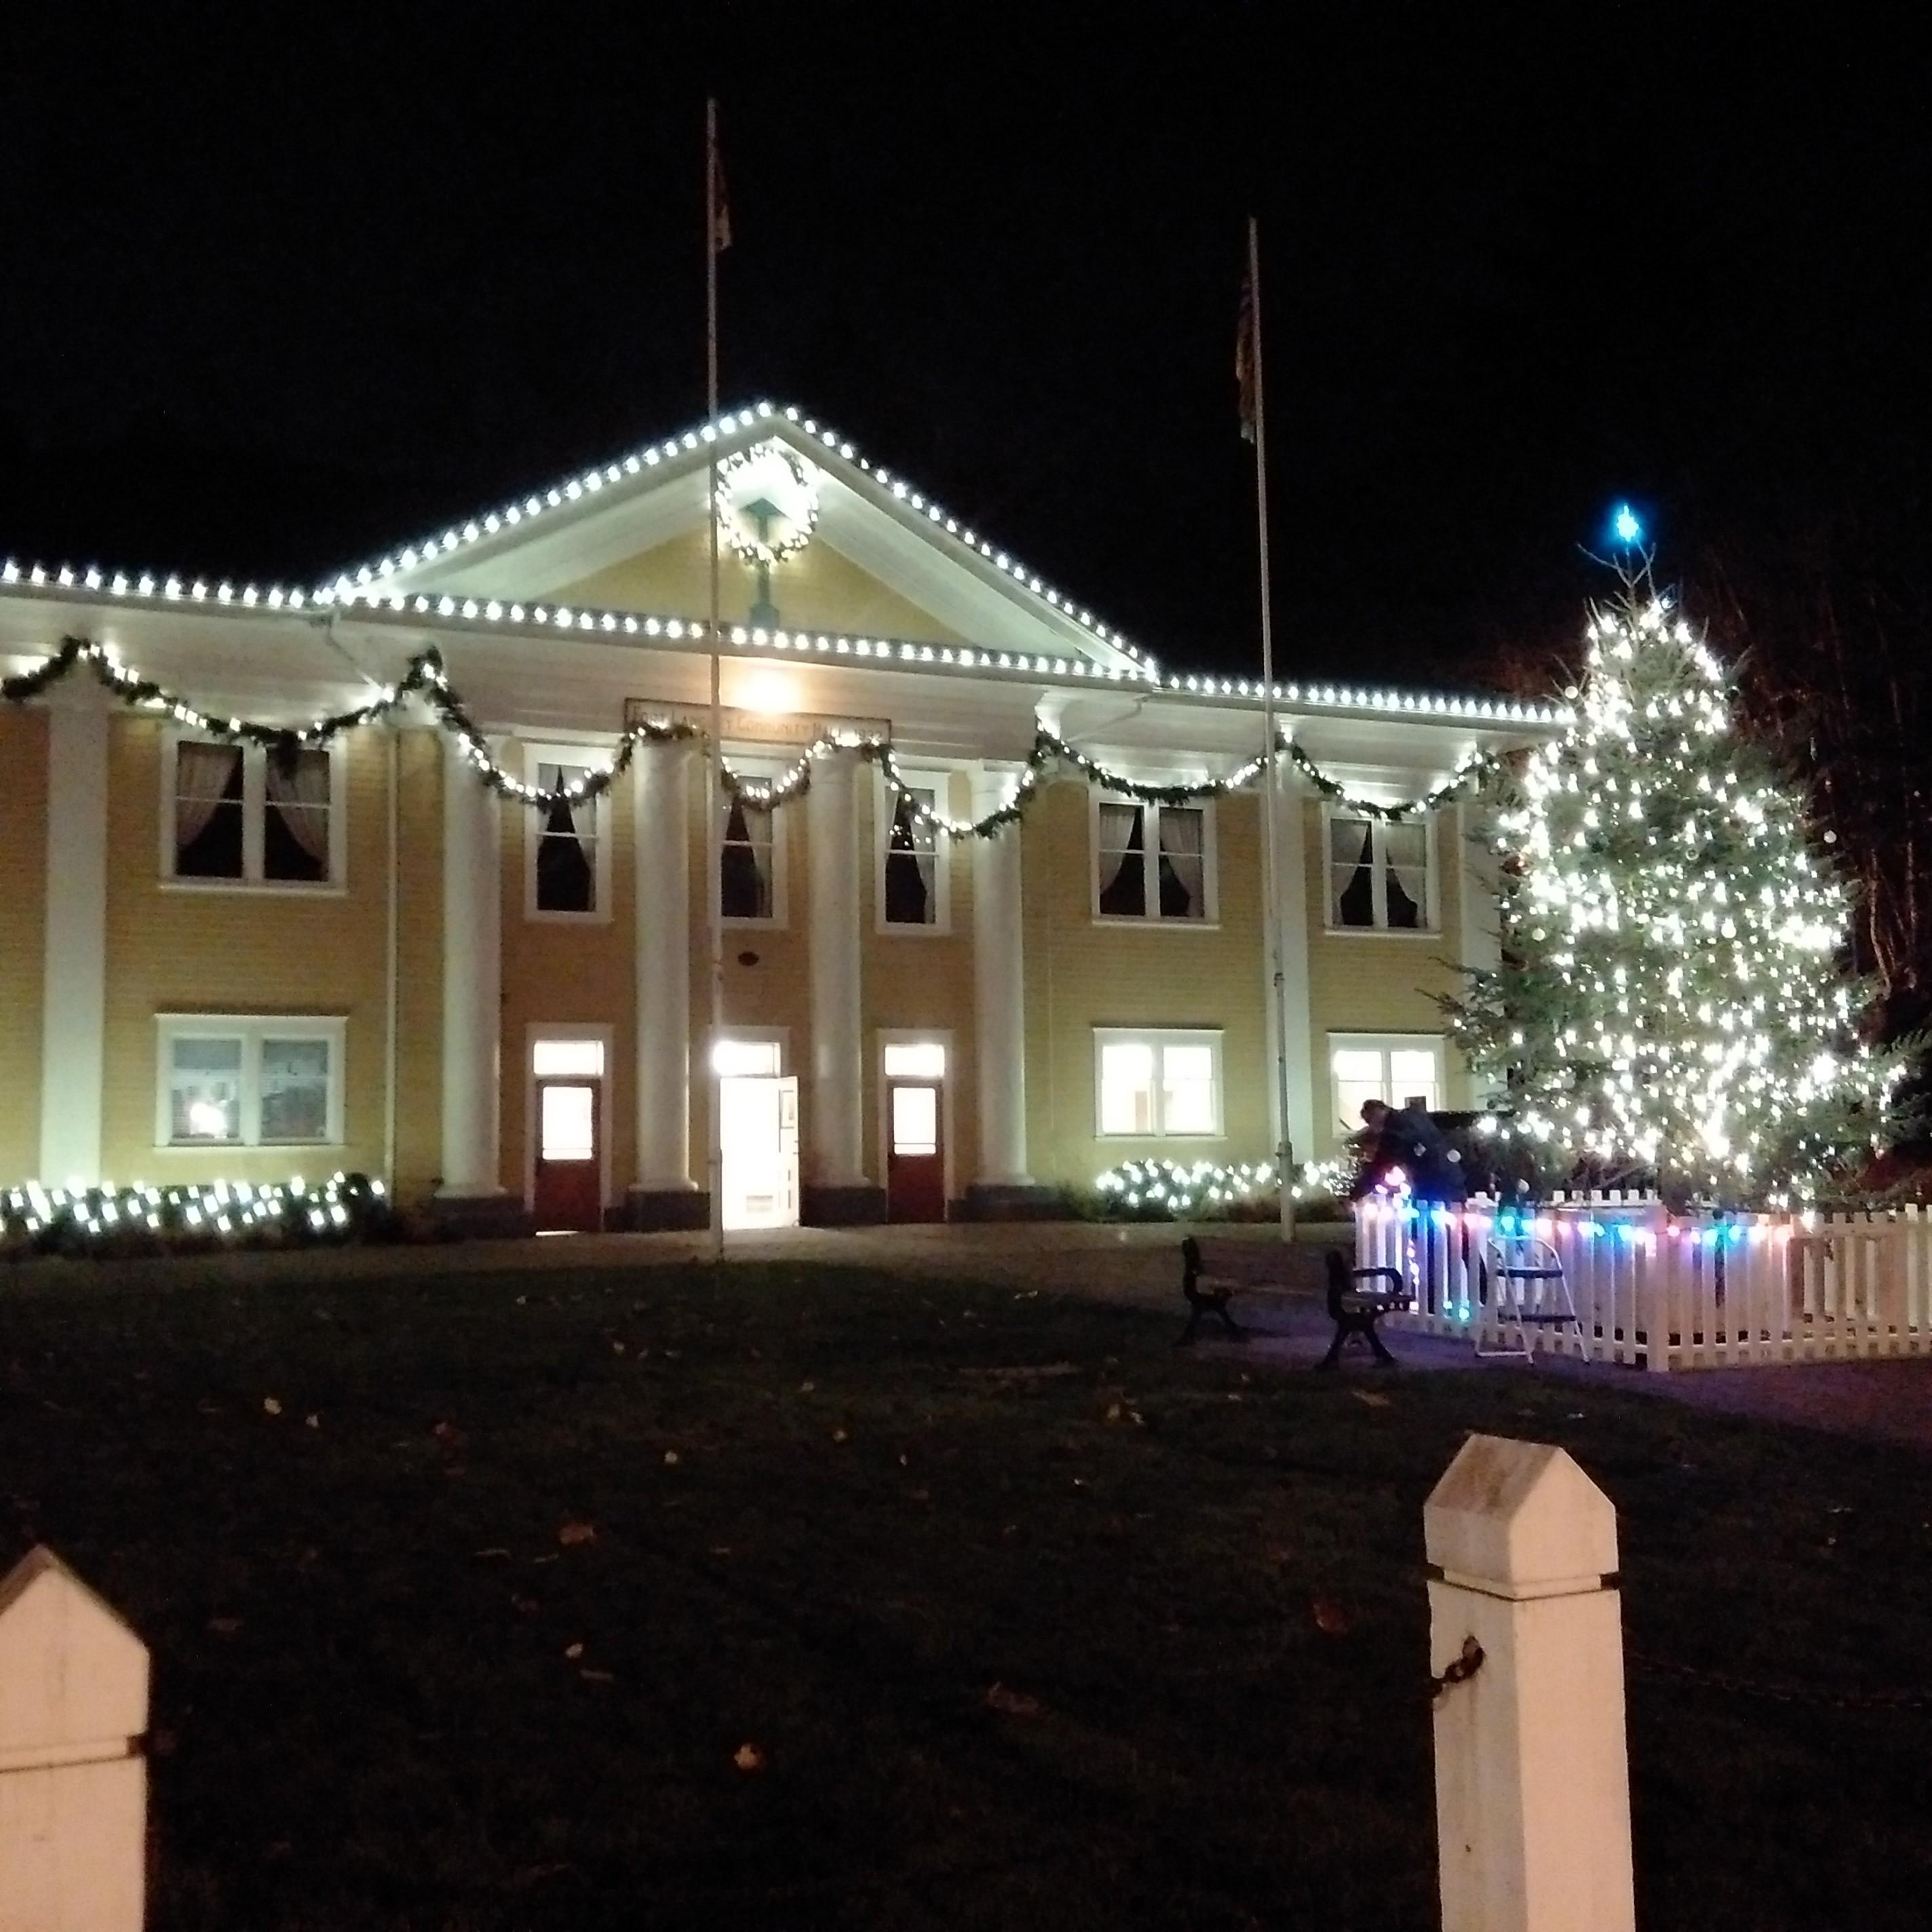 fort-langley-community-hall-christmas-lights & Fort Langley Tree Lighting - Fort Langley Community Association azcodes.com